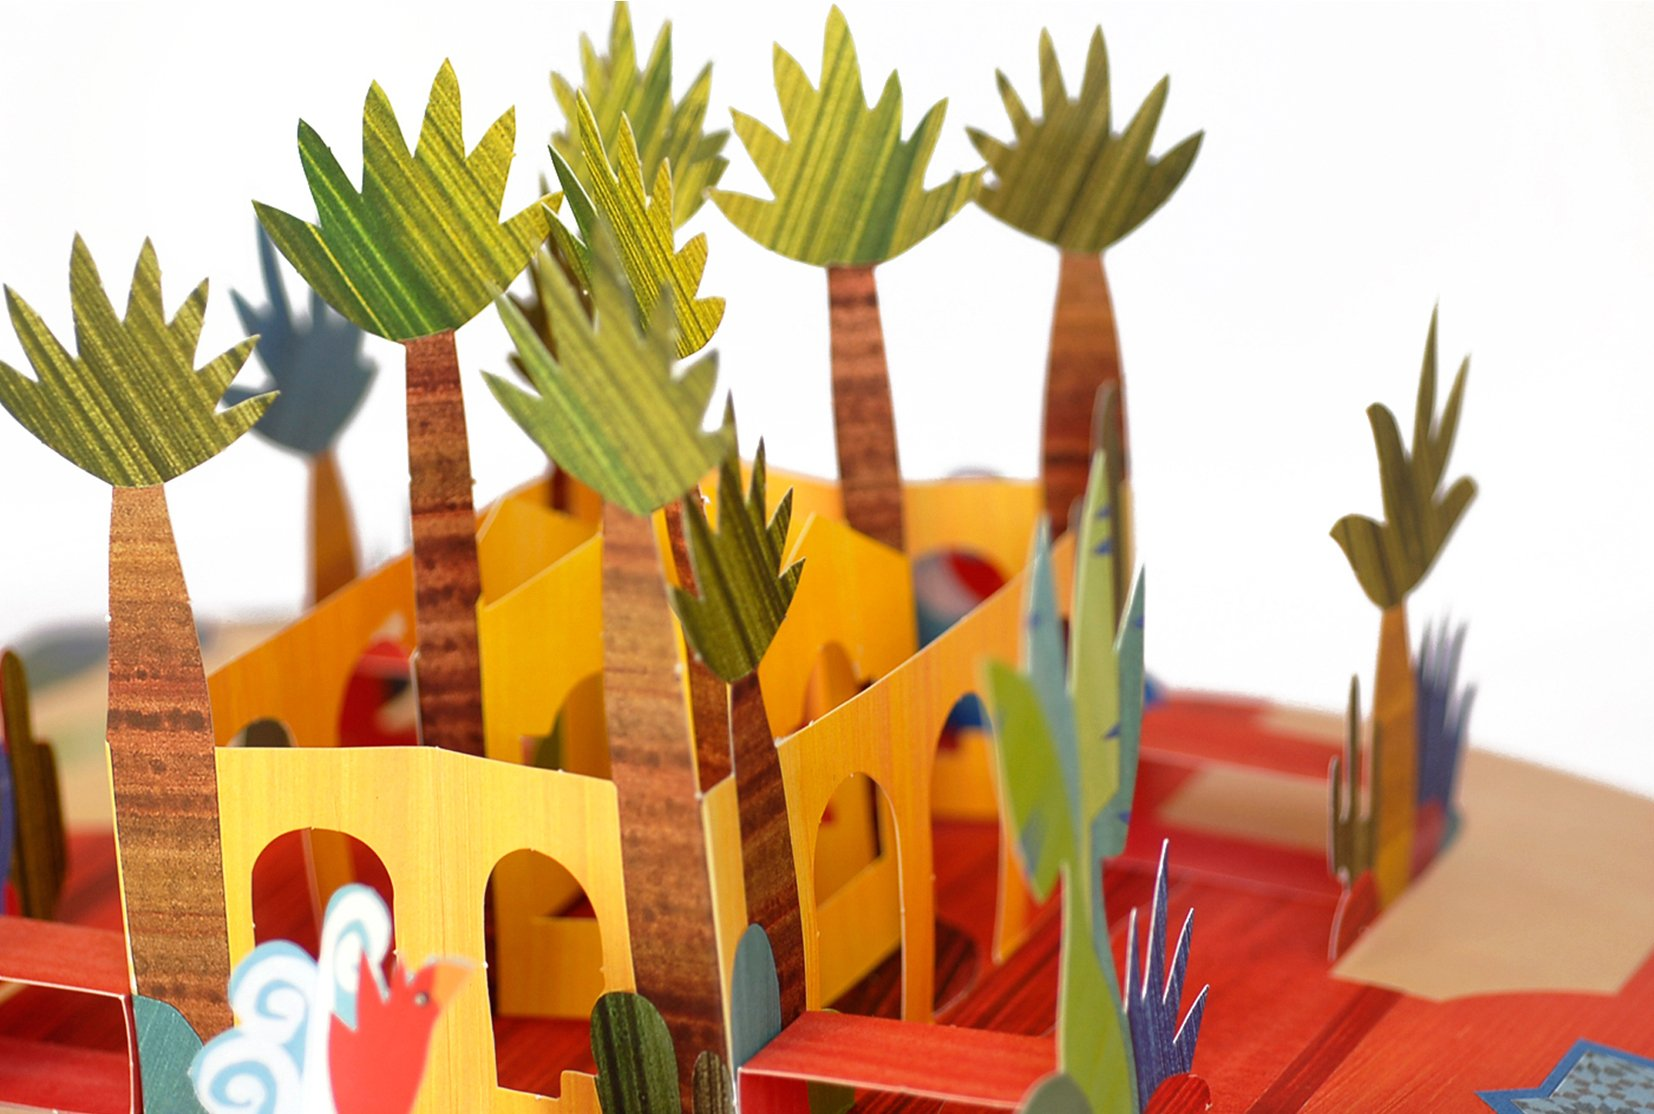 A tiger in my garden a do it yourself pop up book arno a tiger in my garden a do it yourself pop up book arno 9783791371931 amazon books solutioingenieria Choice Image